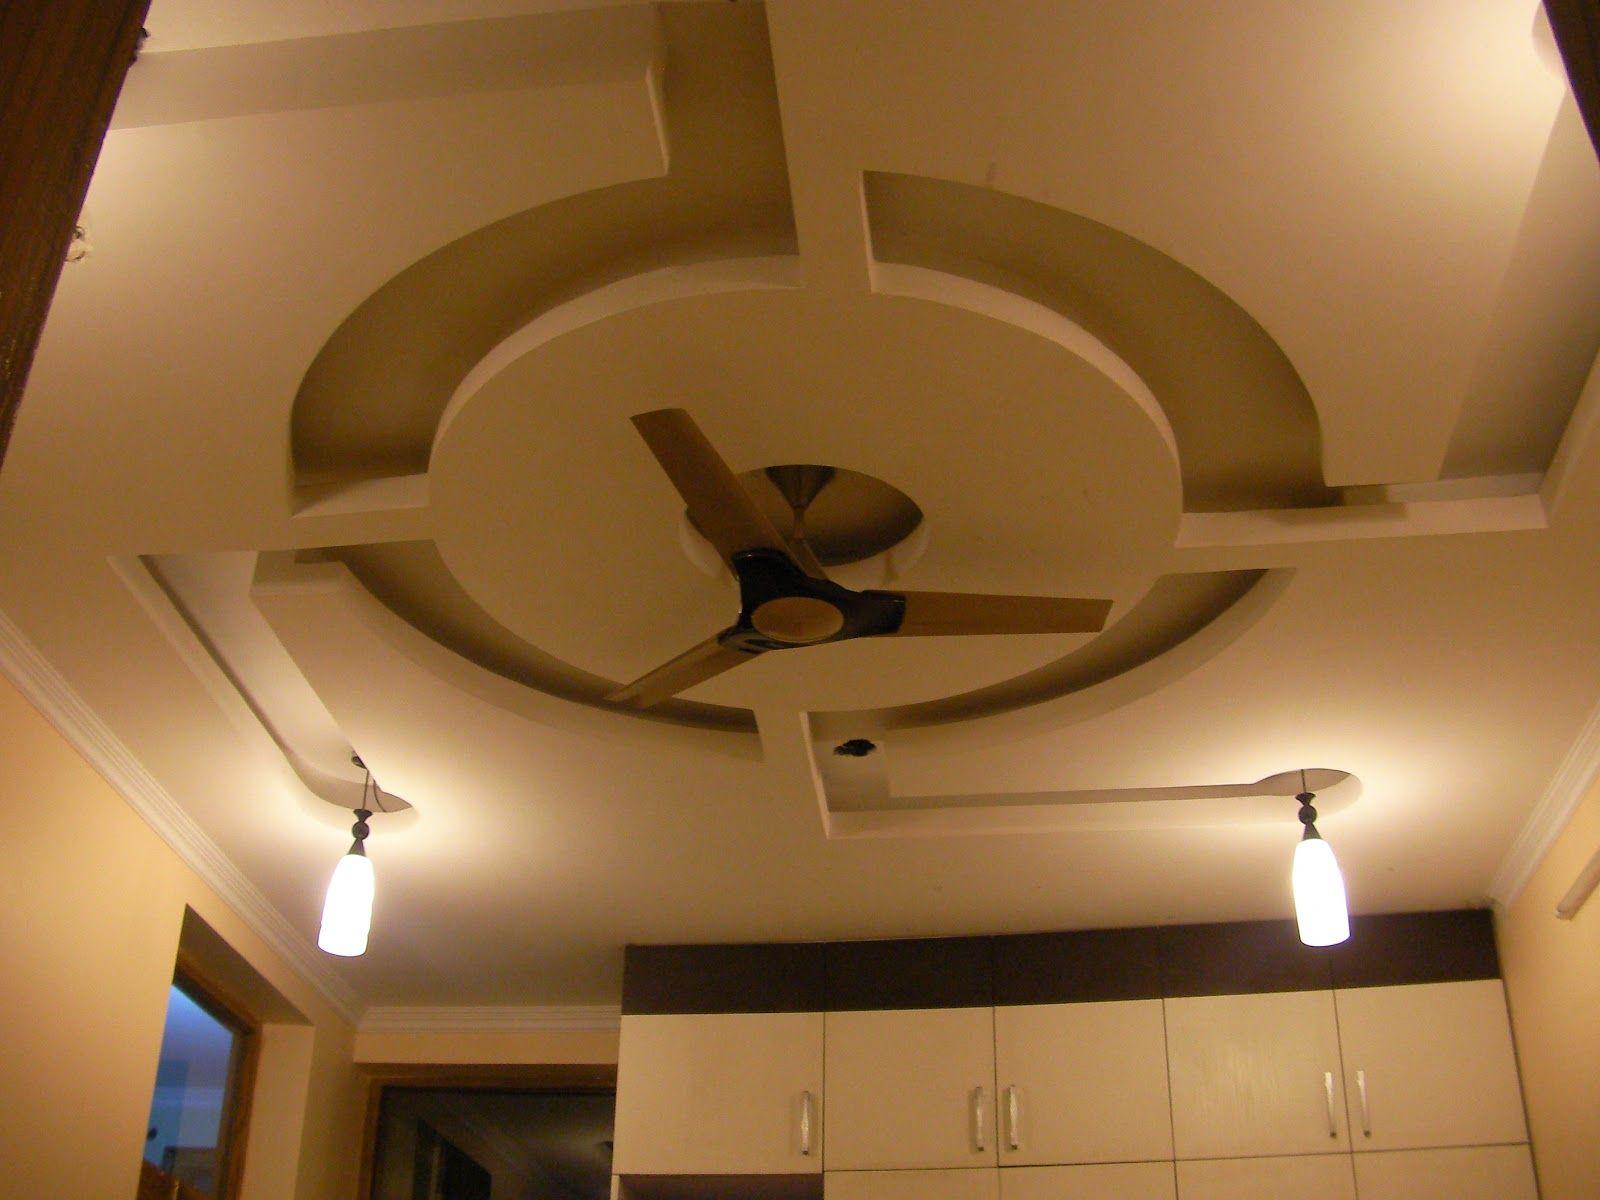 ceiling designs #kbhomes - ceiling design | pinterest